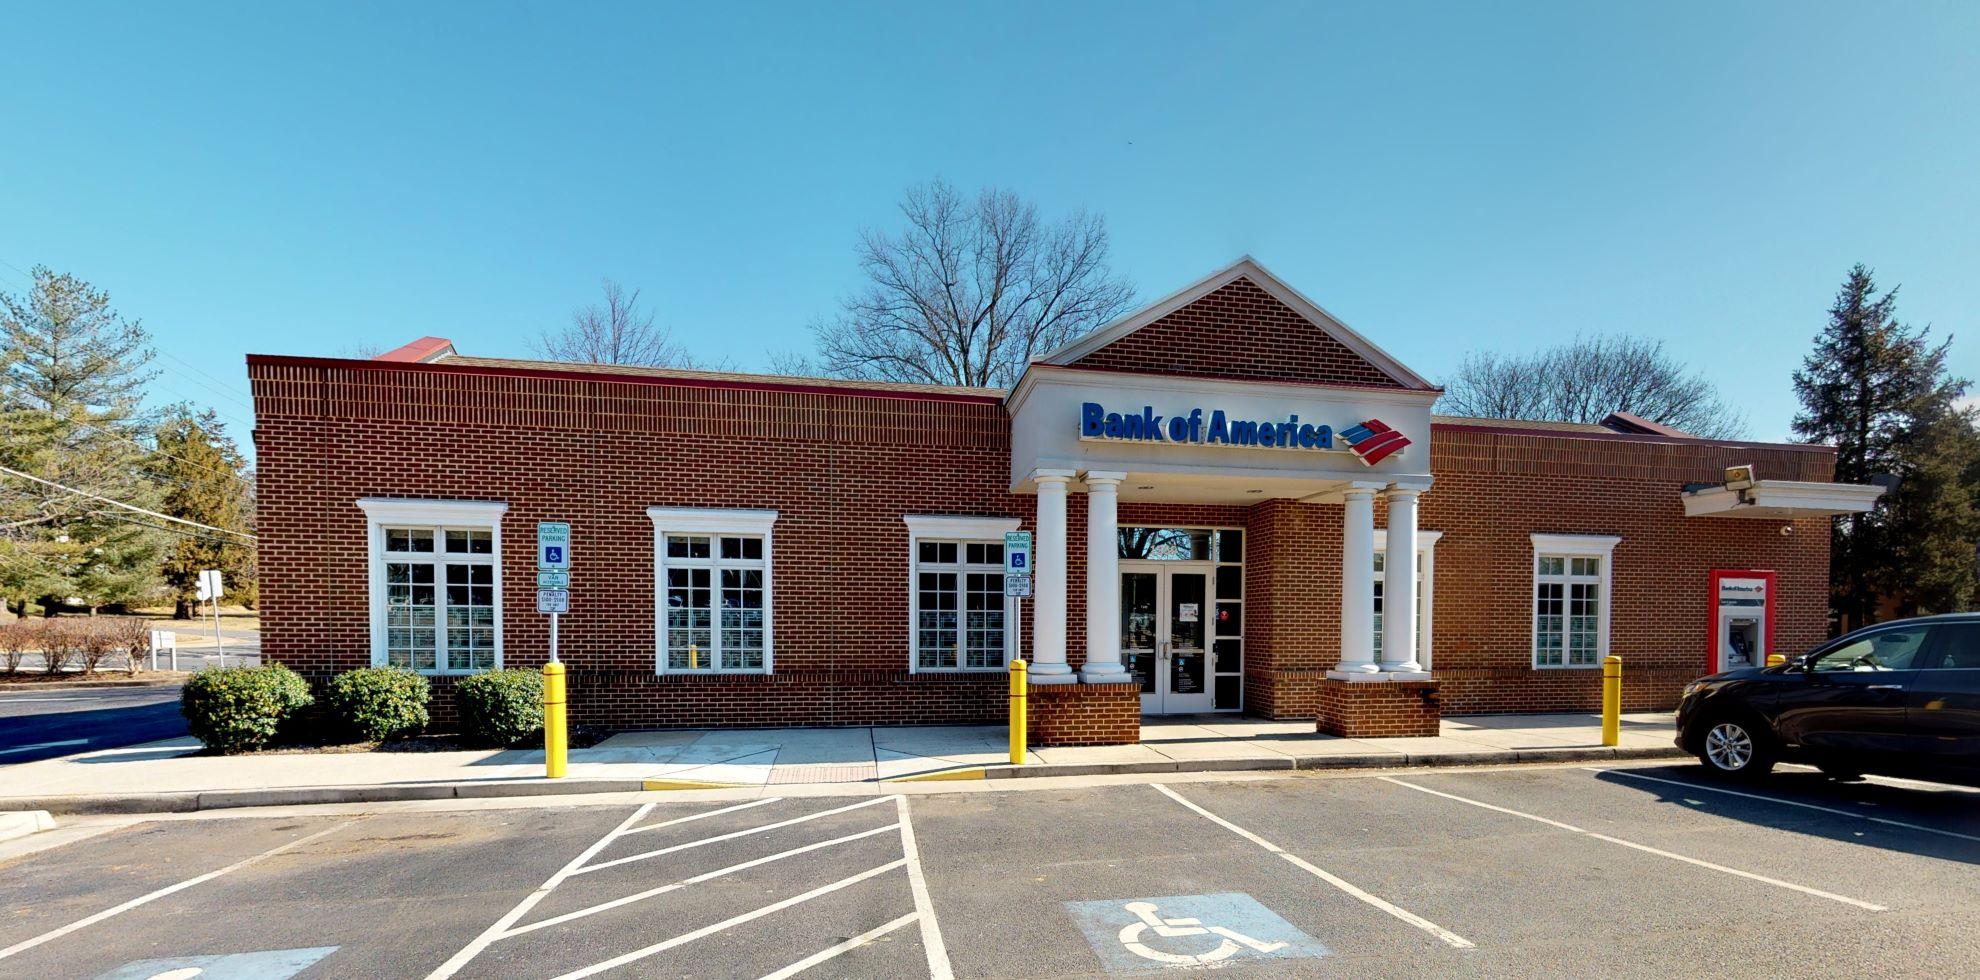 Bank of America financial center with drive-thru ATM   1369 Chain Bridge Rd, McLean, VA 22101